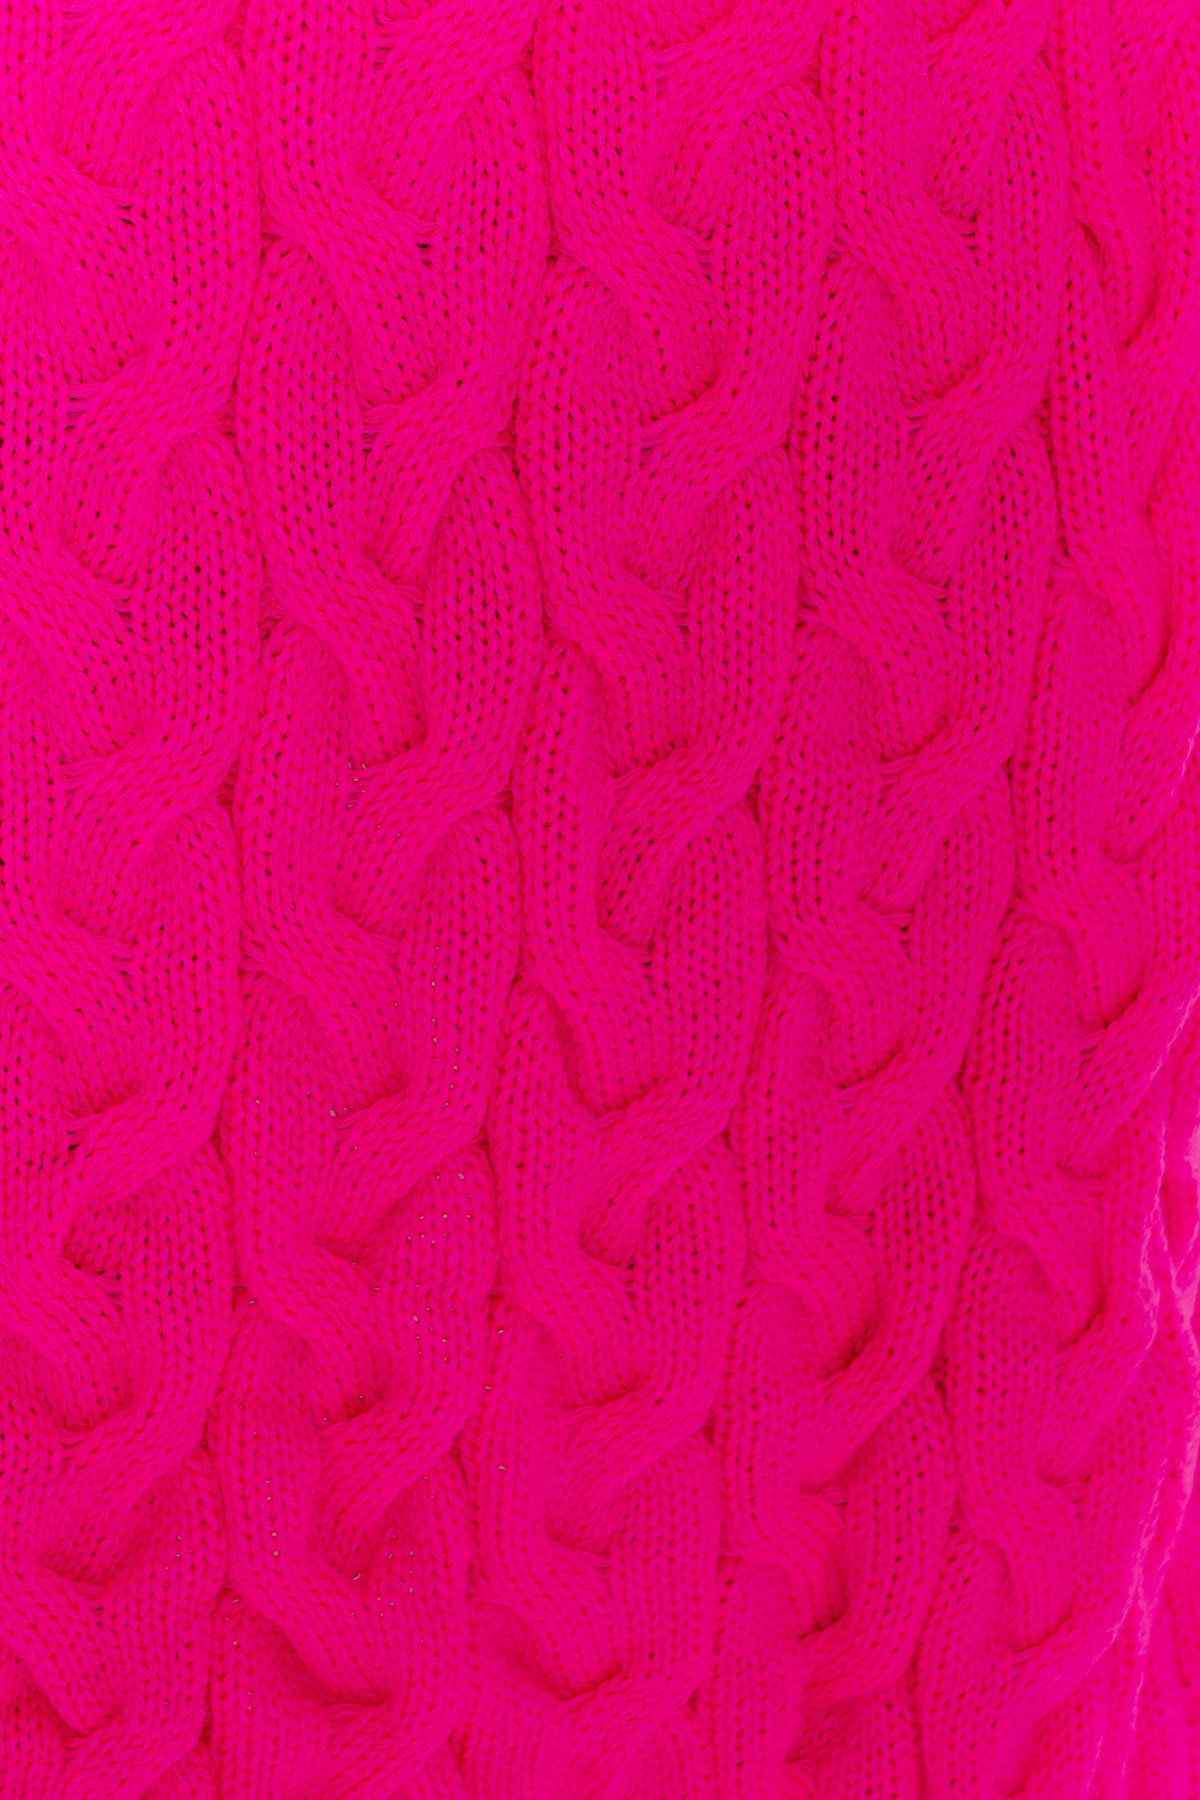 Кардиган длинный Лало АРТ. 7017 Цвет: Фуксия 2593 - фото 4, интернет магазин tm-modus.ru